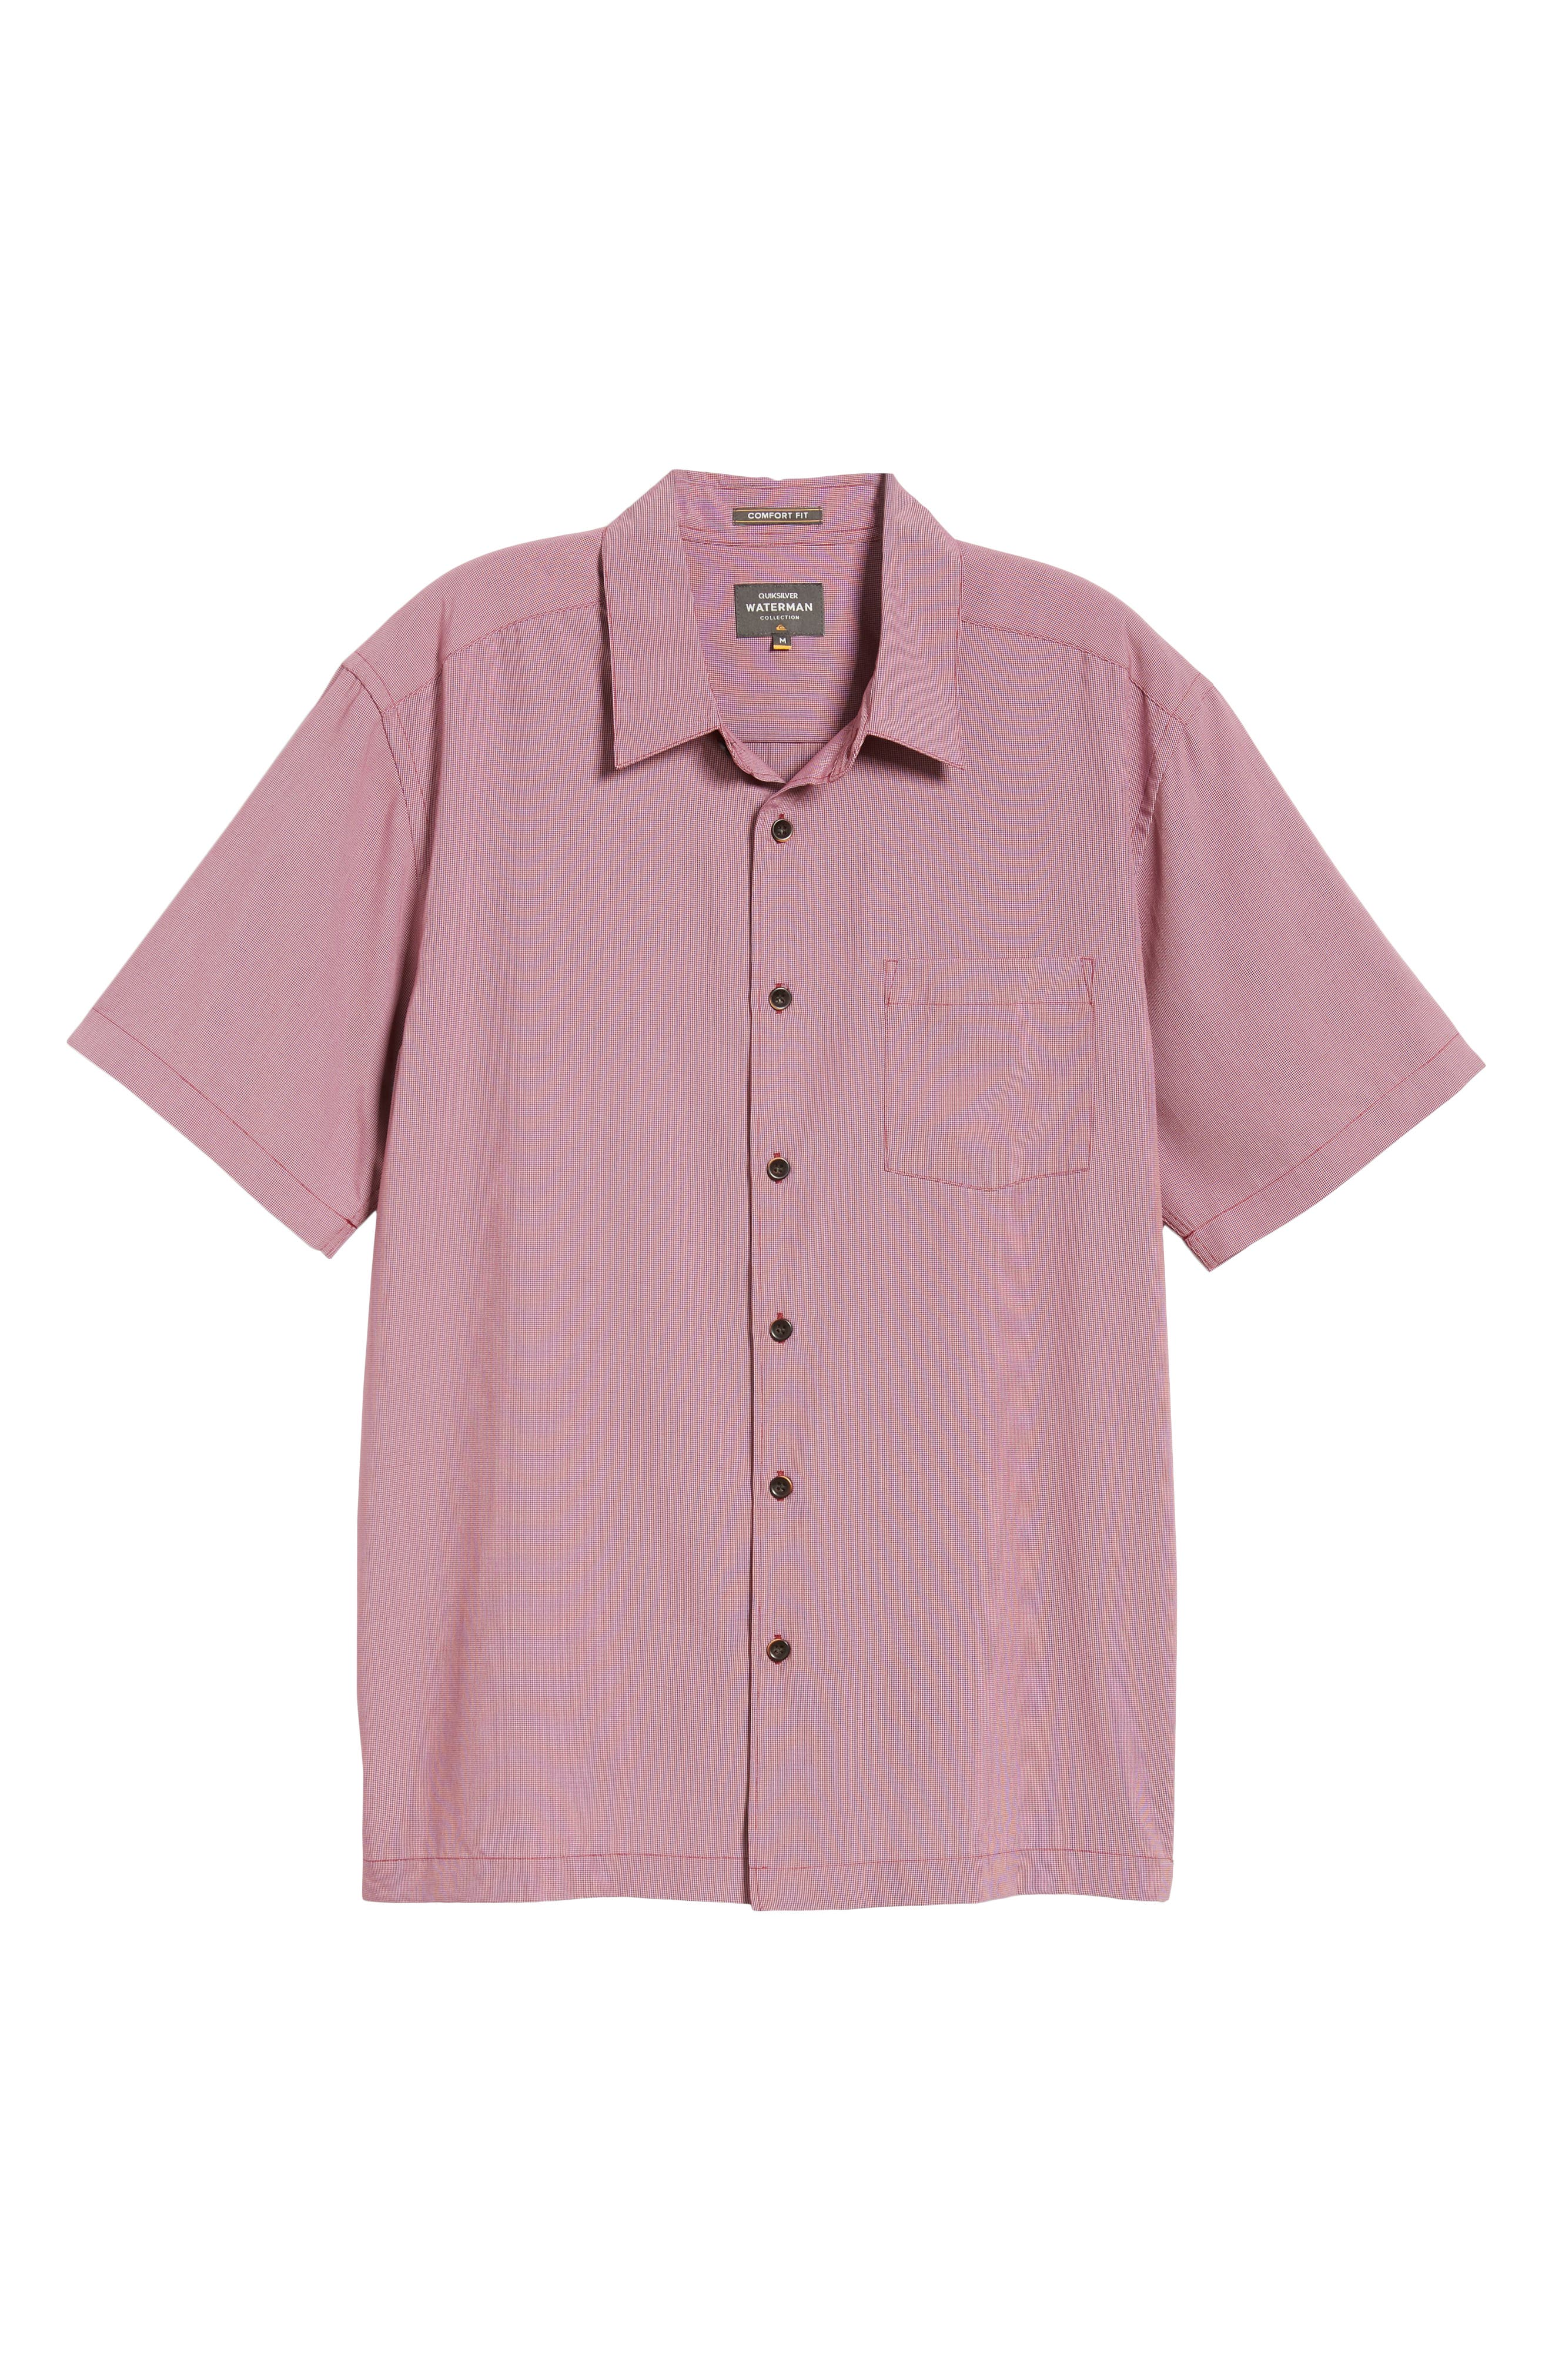 Cane Island Classic Fit Camp Shirt,                             Alternate thumbnail 5, color,                             TAWNY PORT